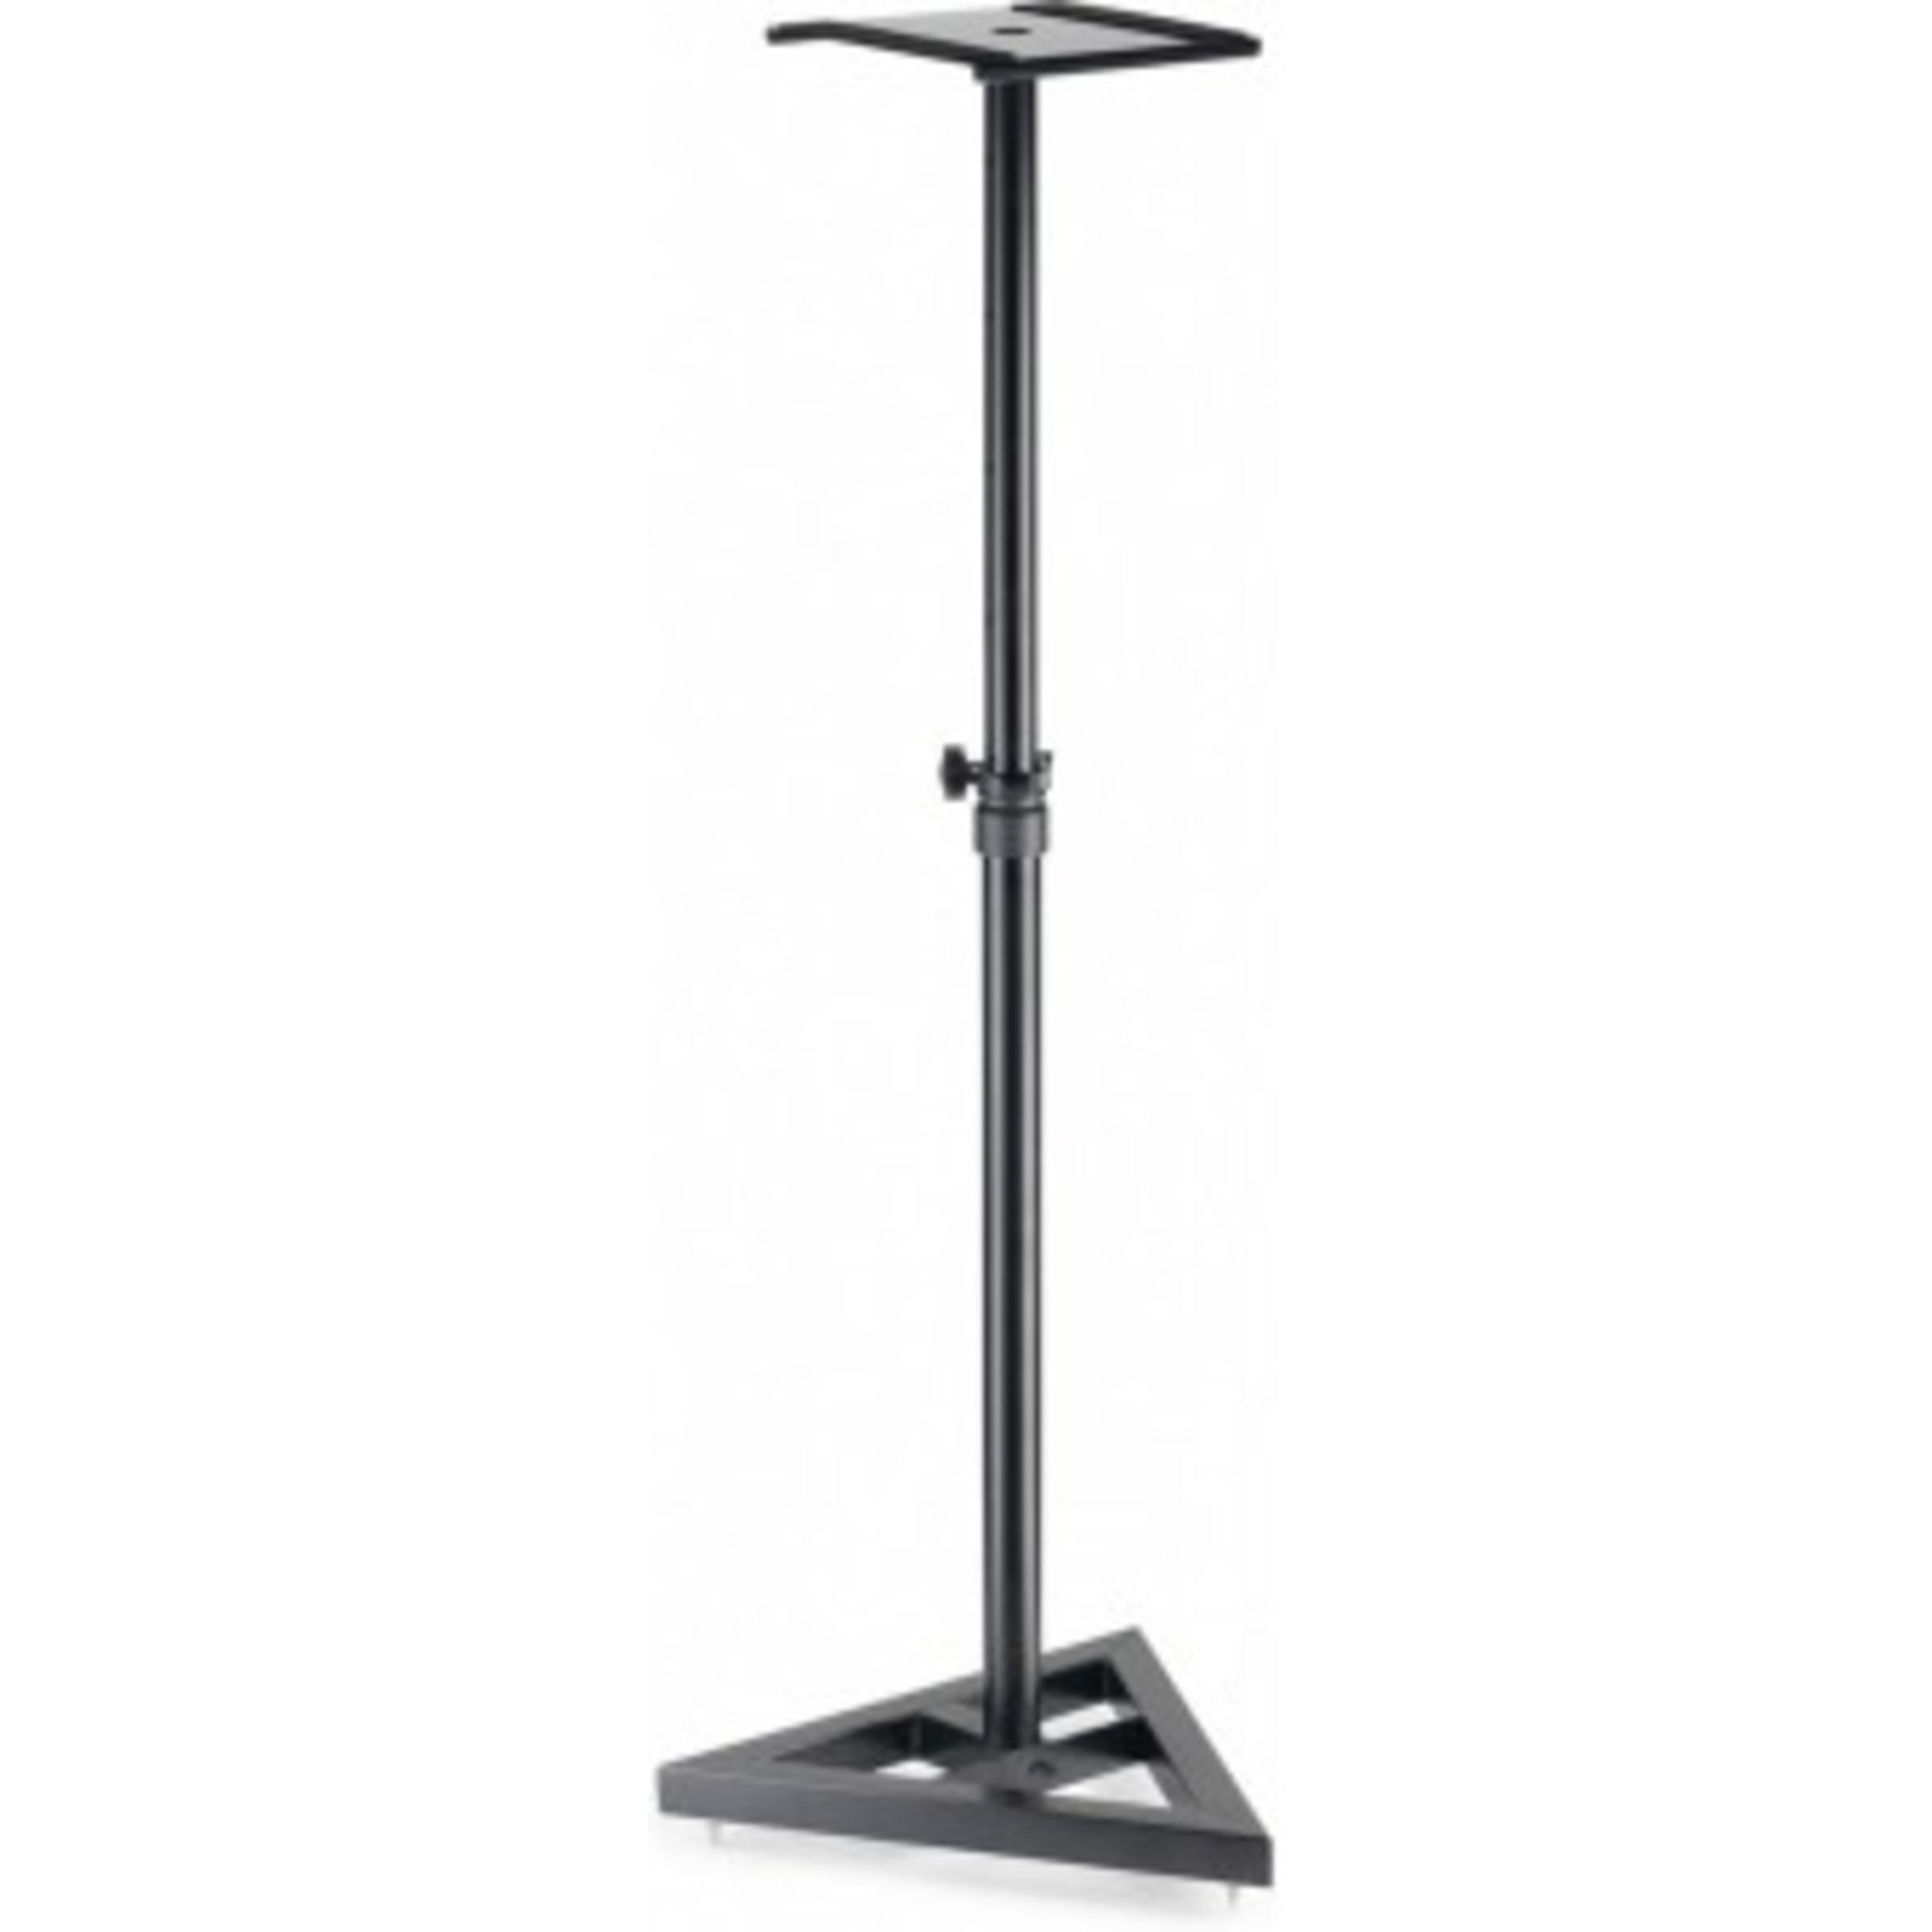 stagg studio speaker monitor stand single giggear. Black Bedroom Furniture Sets. Home Design Ideas